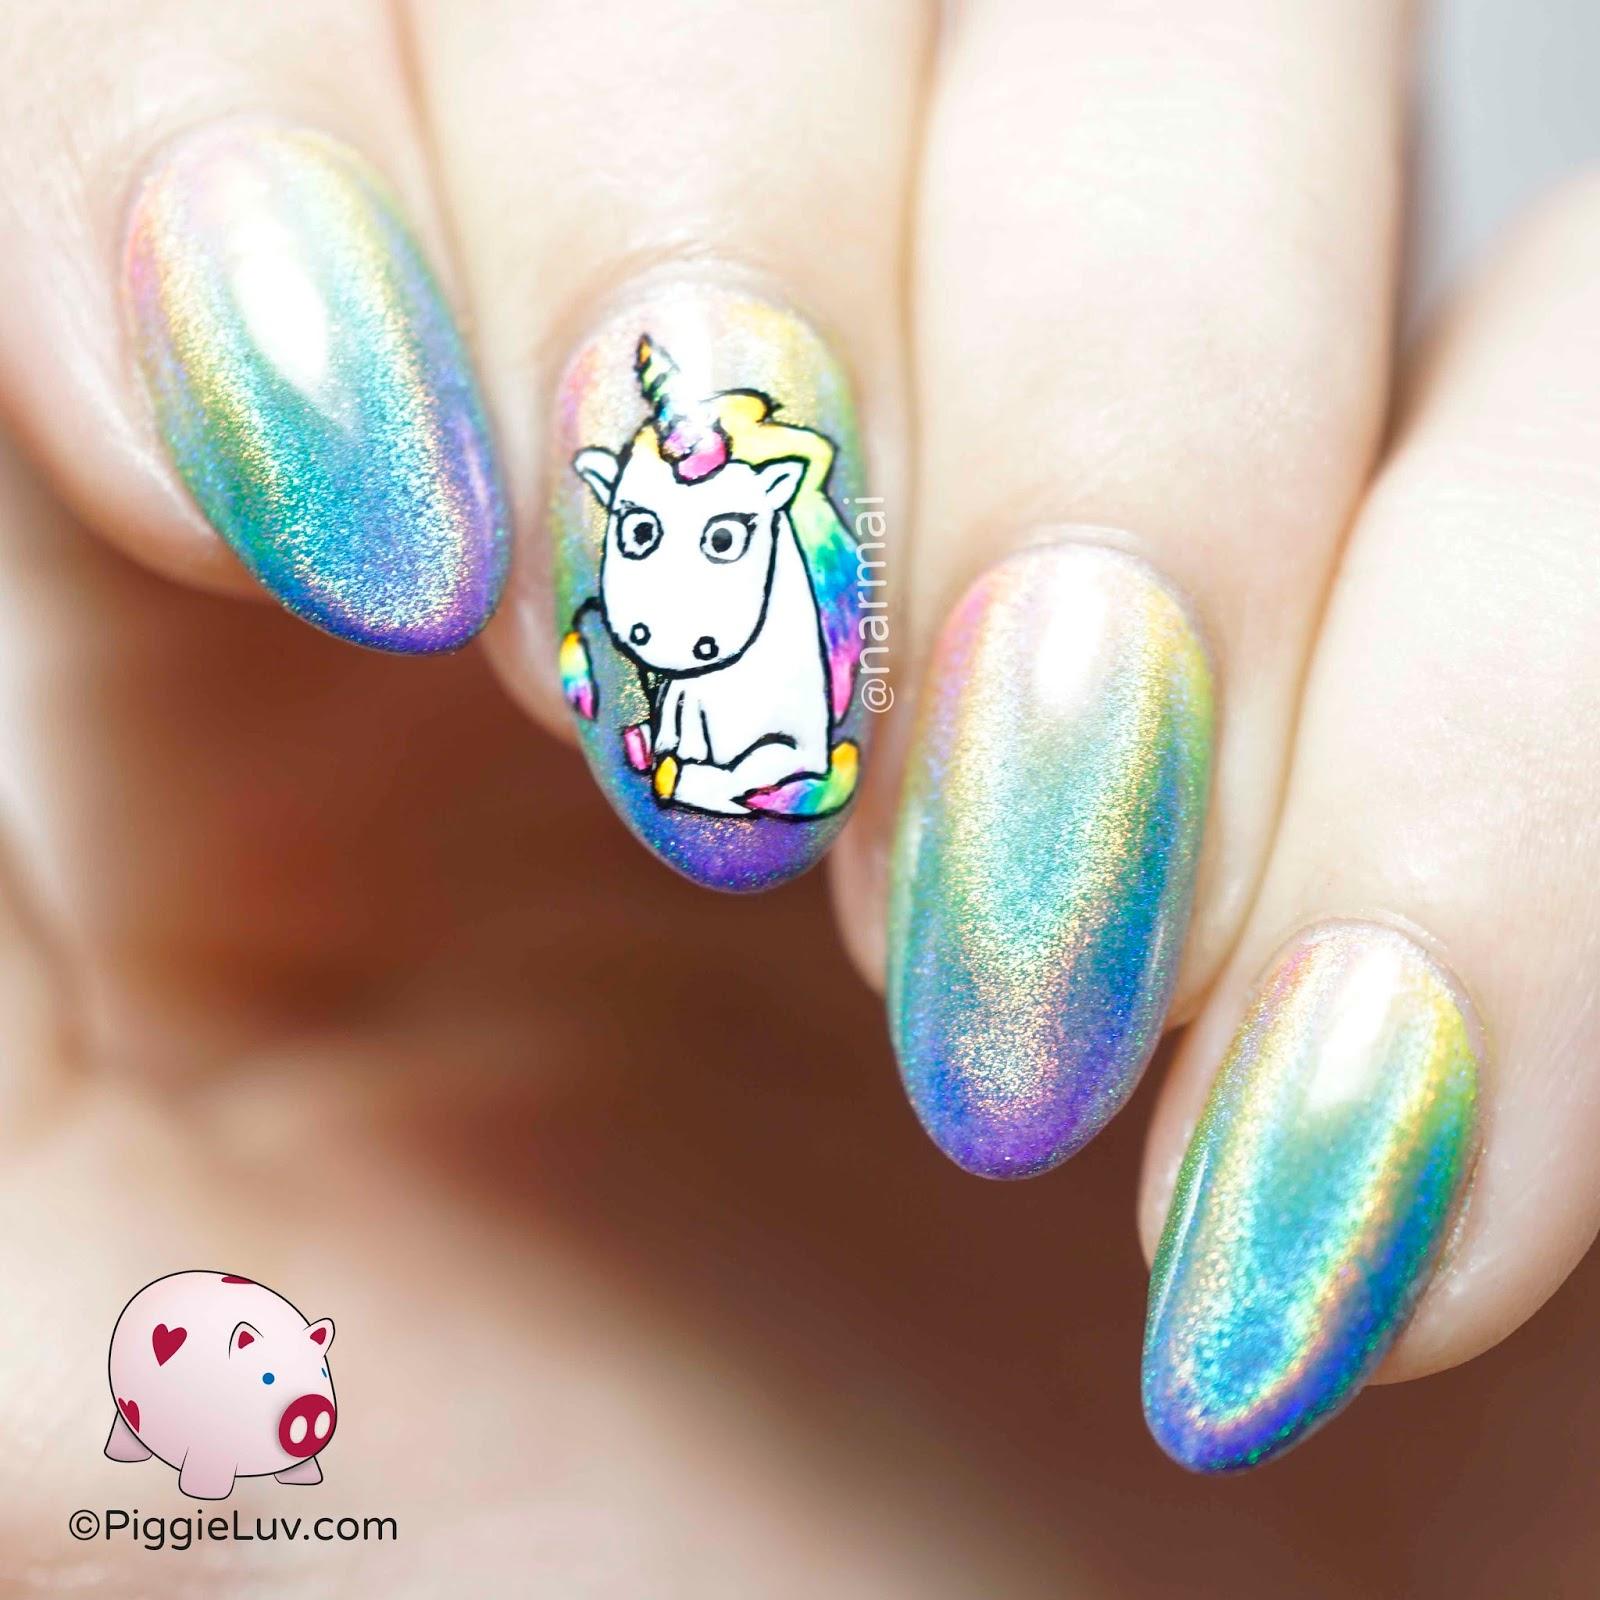 Piggieluv holo rainbow unicorn nail art holo rainbow unicorn nail art prinsesfo Image collections